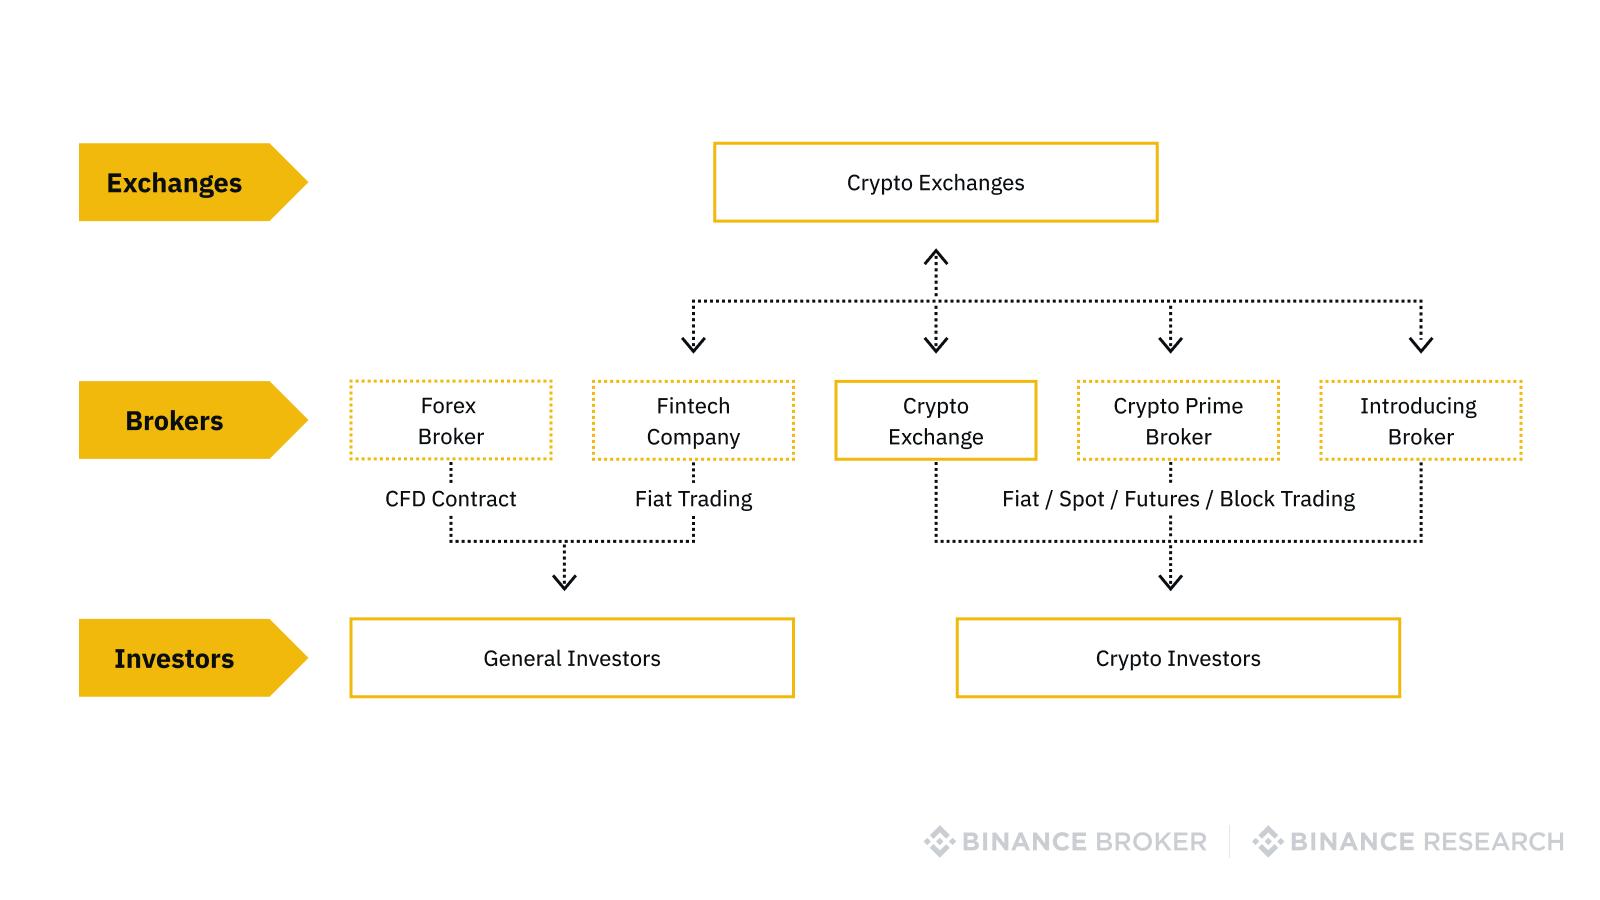 Organization between crypto exchanges, brokers, and investors